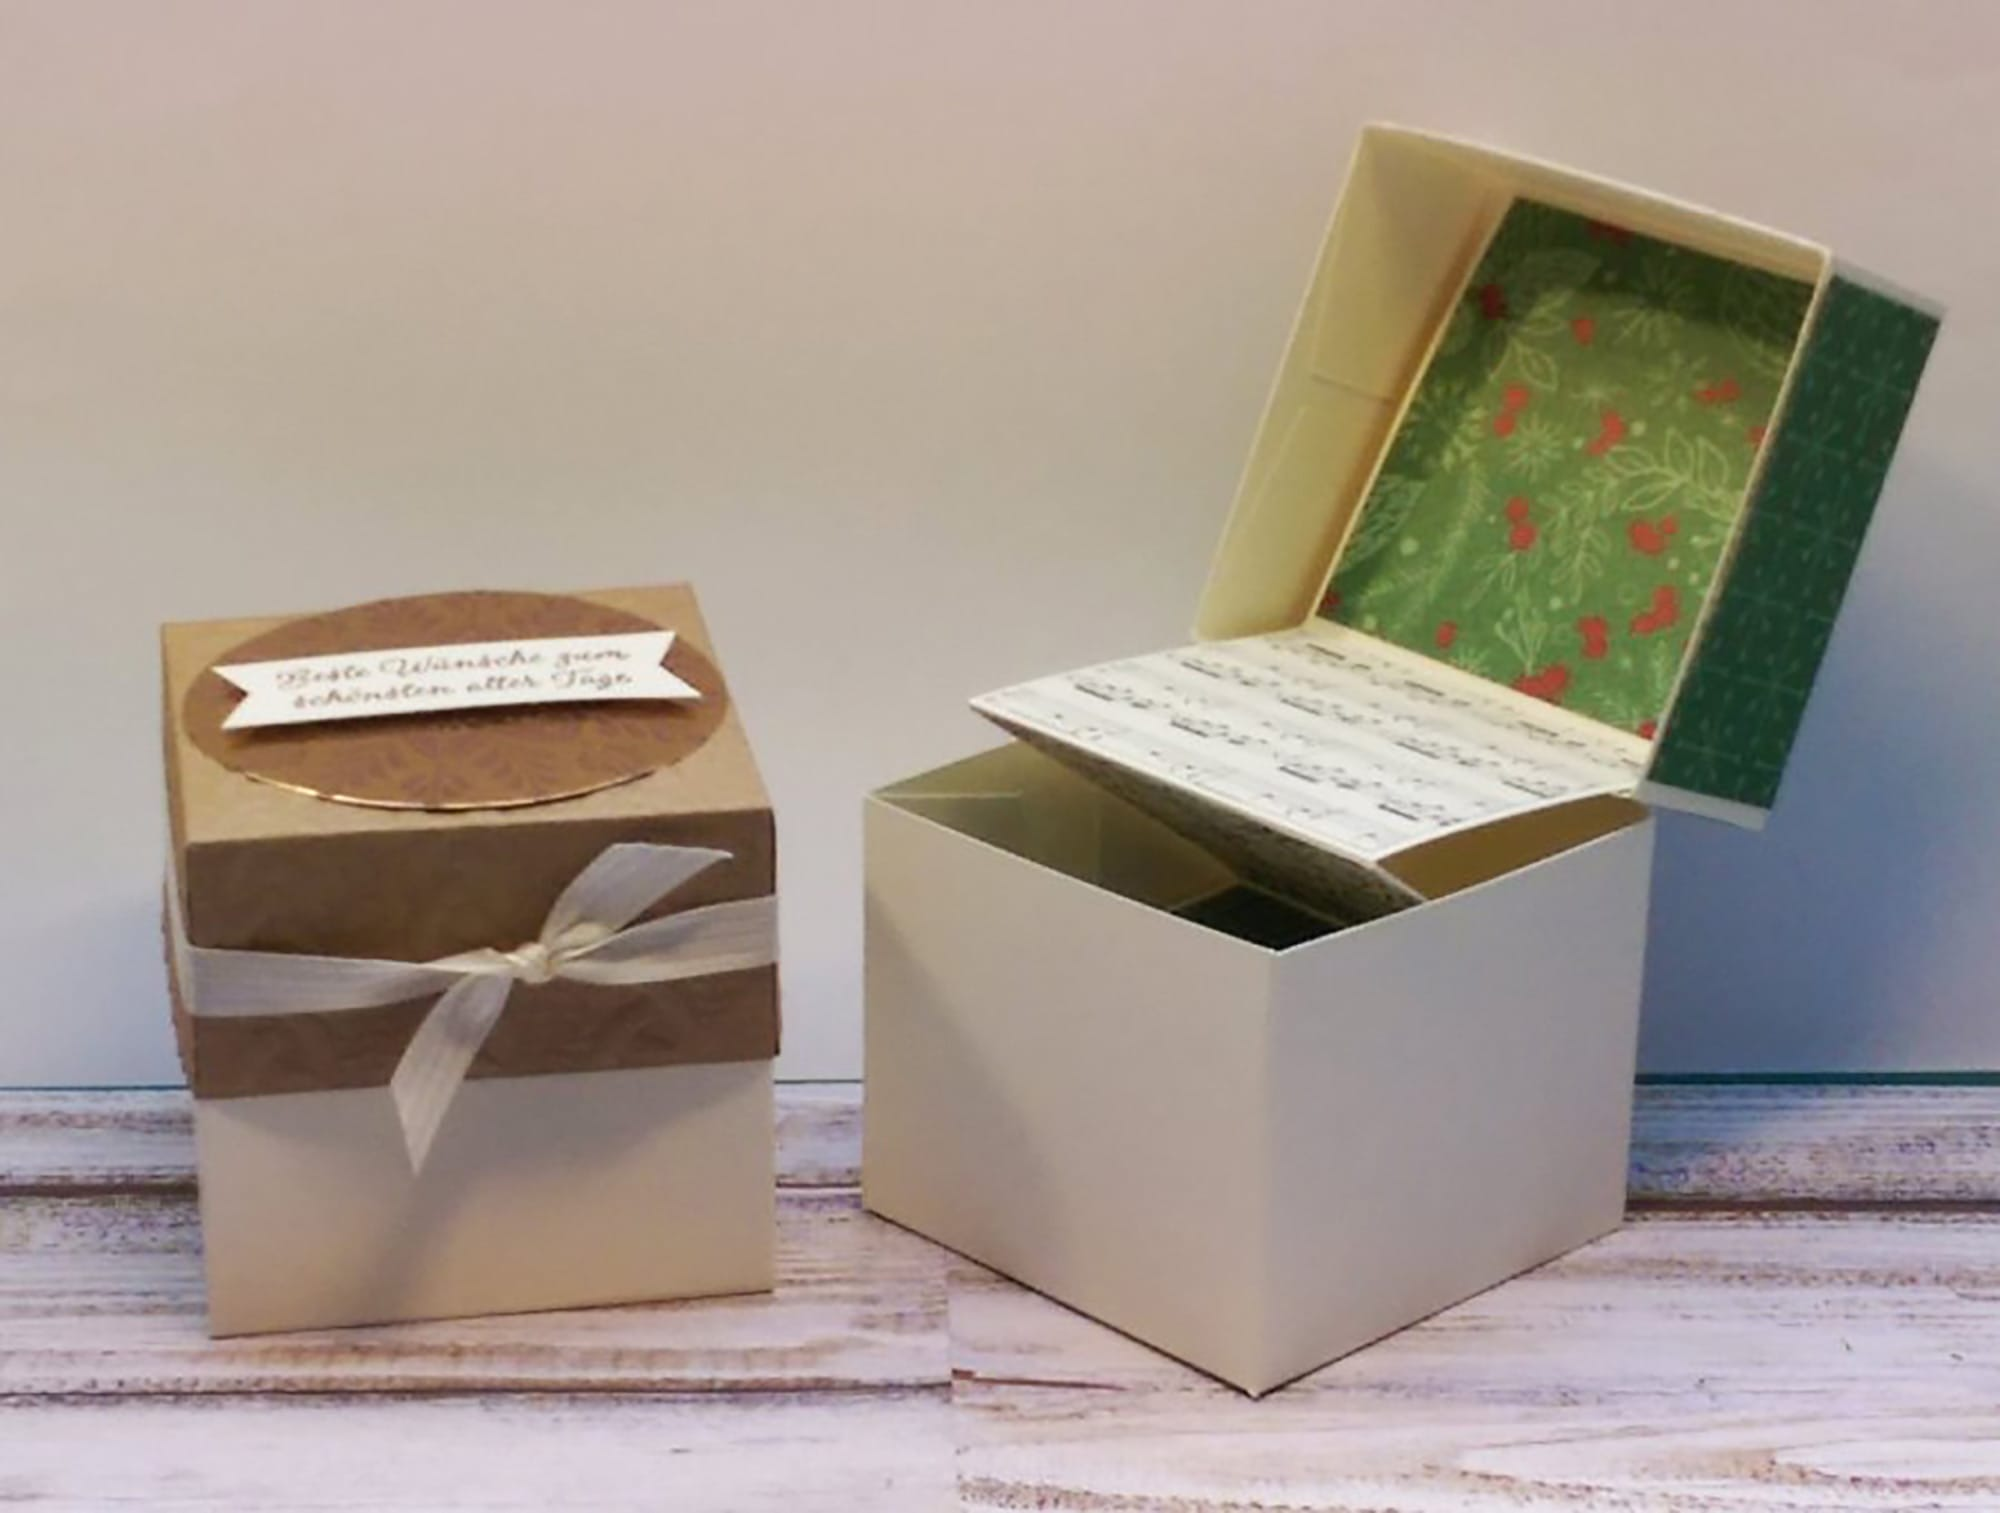 die-papiertante-leporello-box